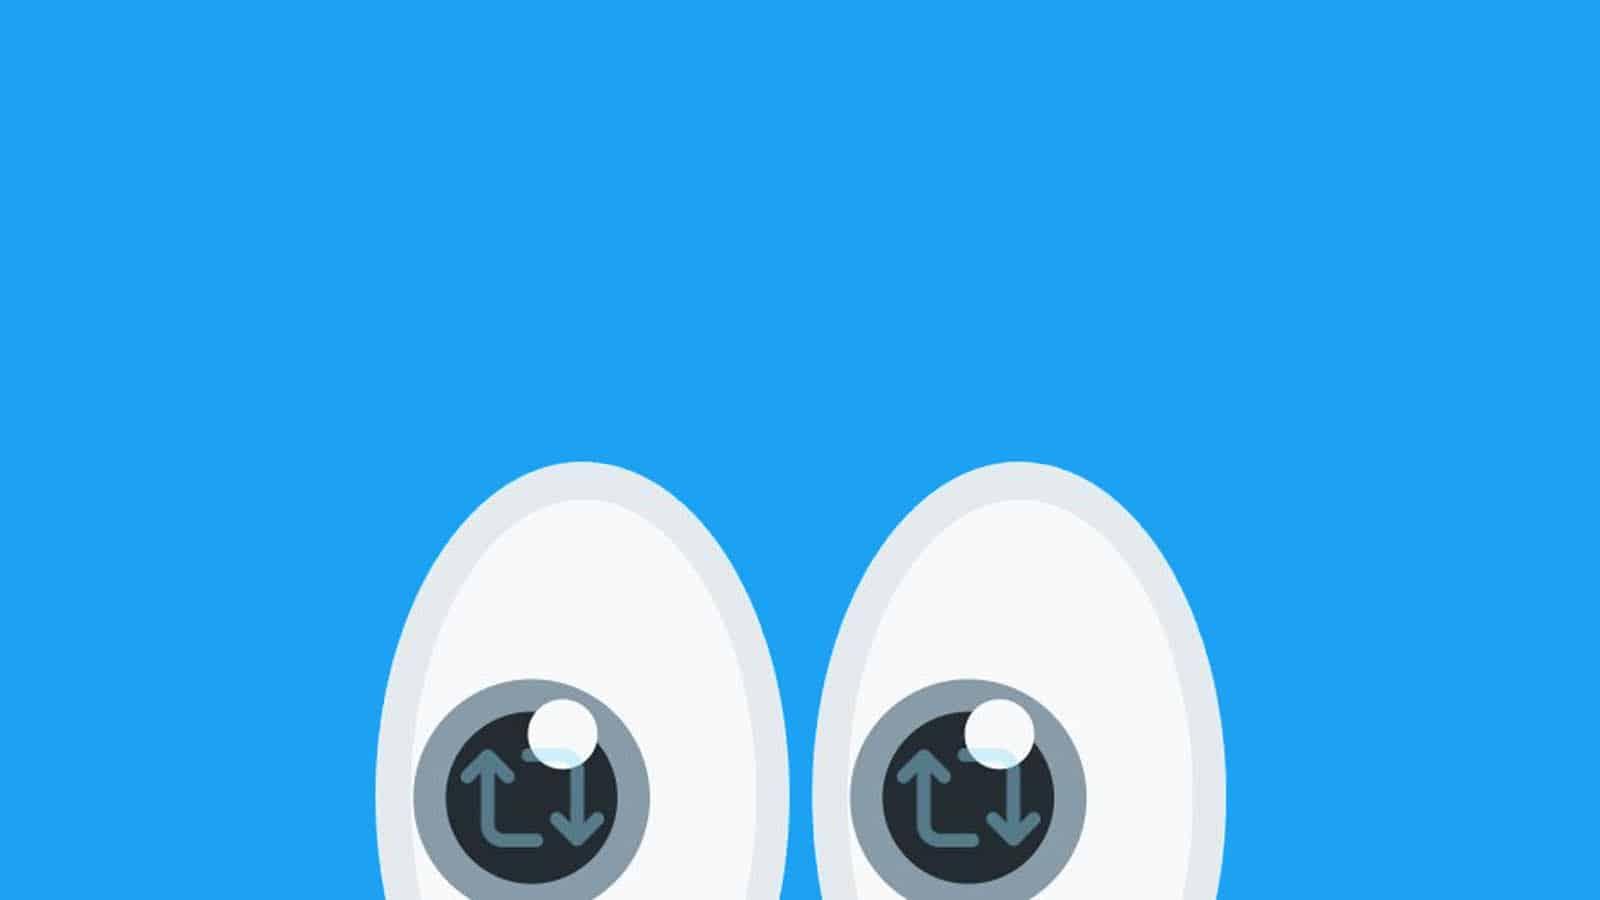 twitter retweets account eyeballs